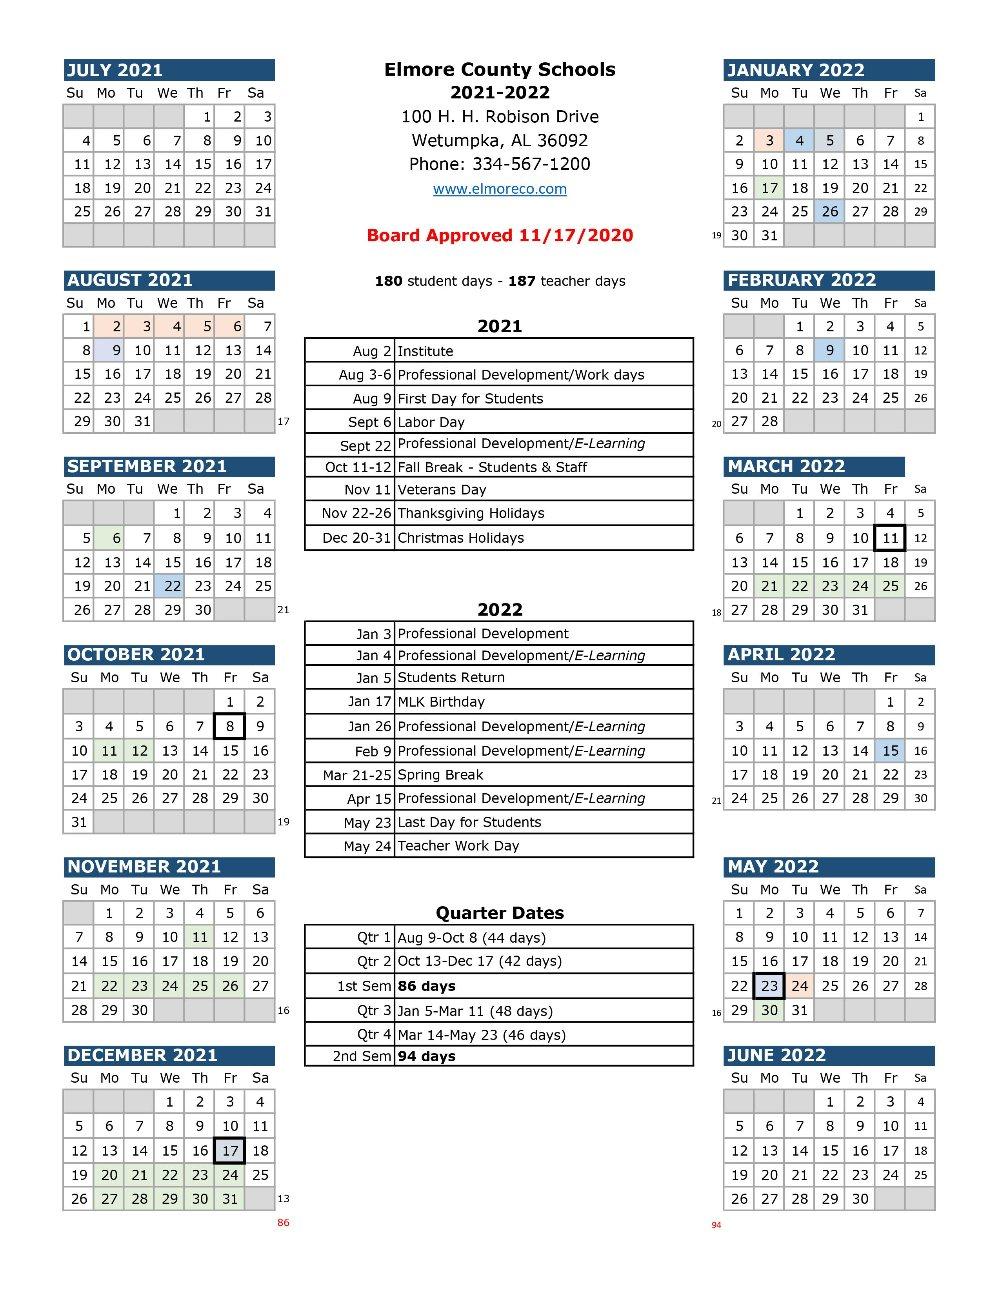 Elmore County School Calendar 2021-2022